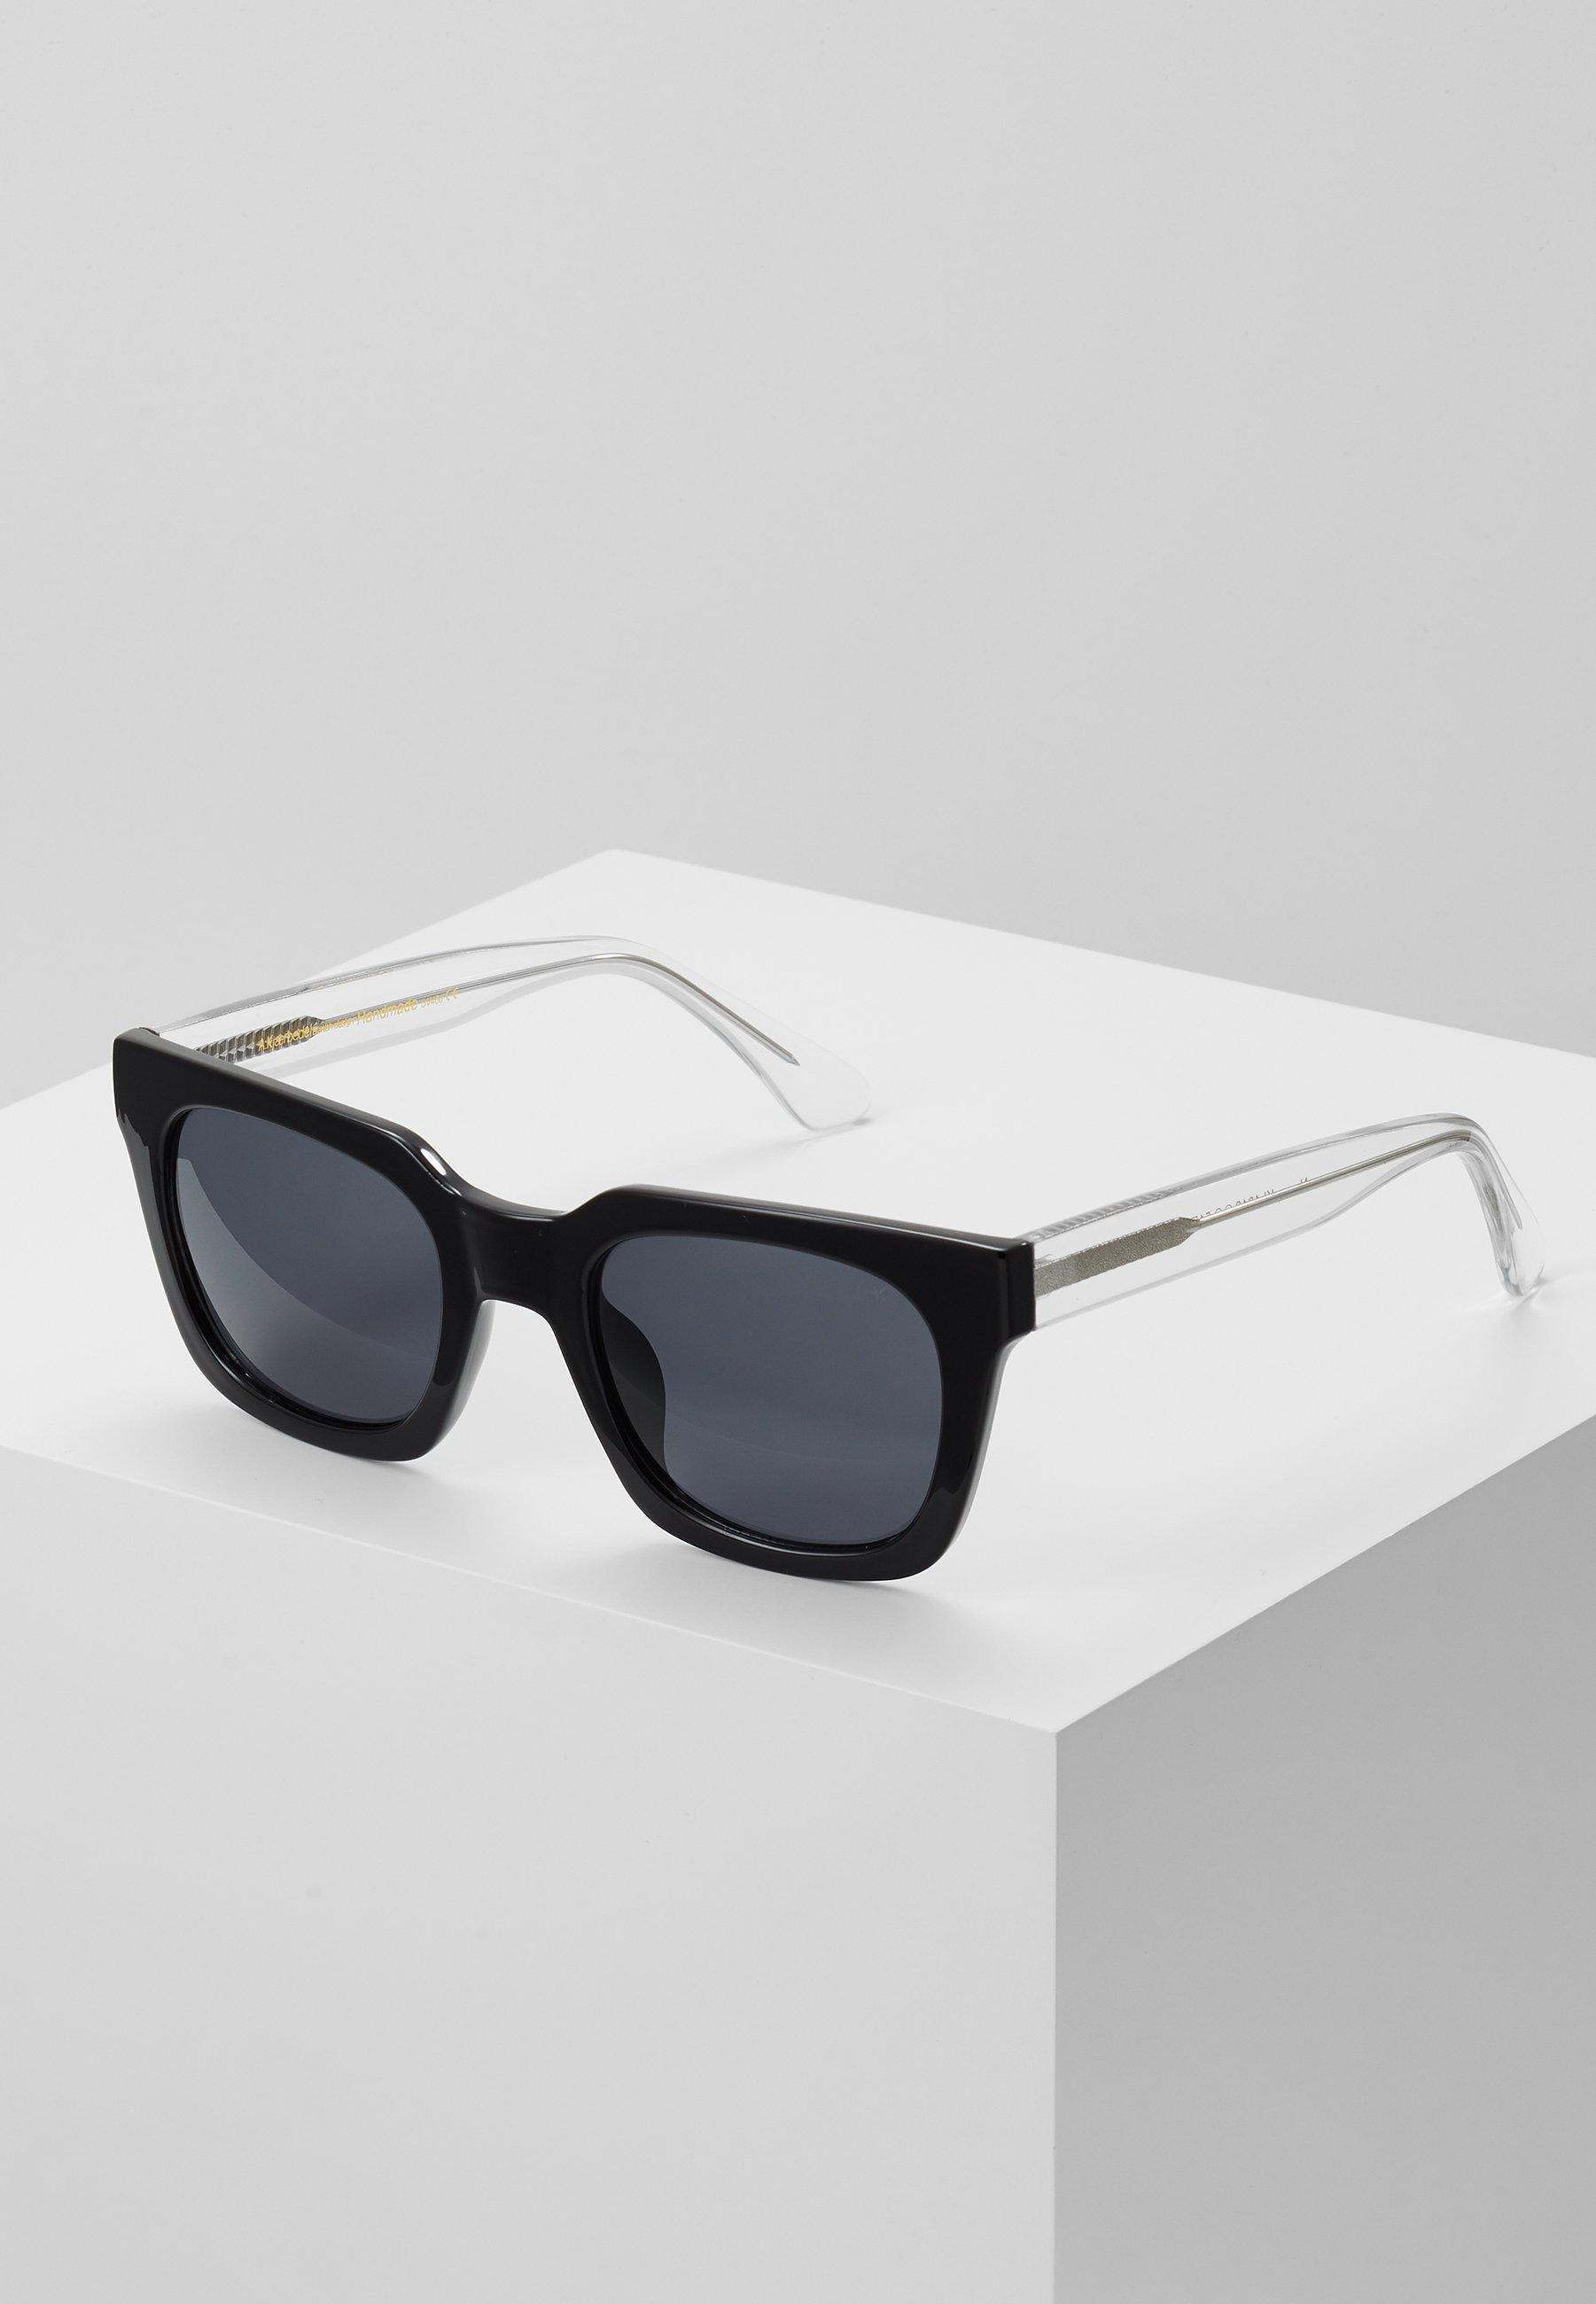 A.Kjærbede NANCY - Sunglasses - black